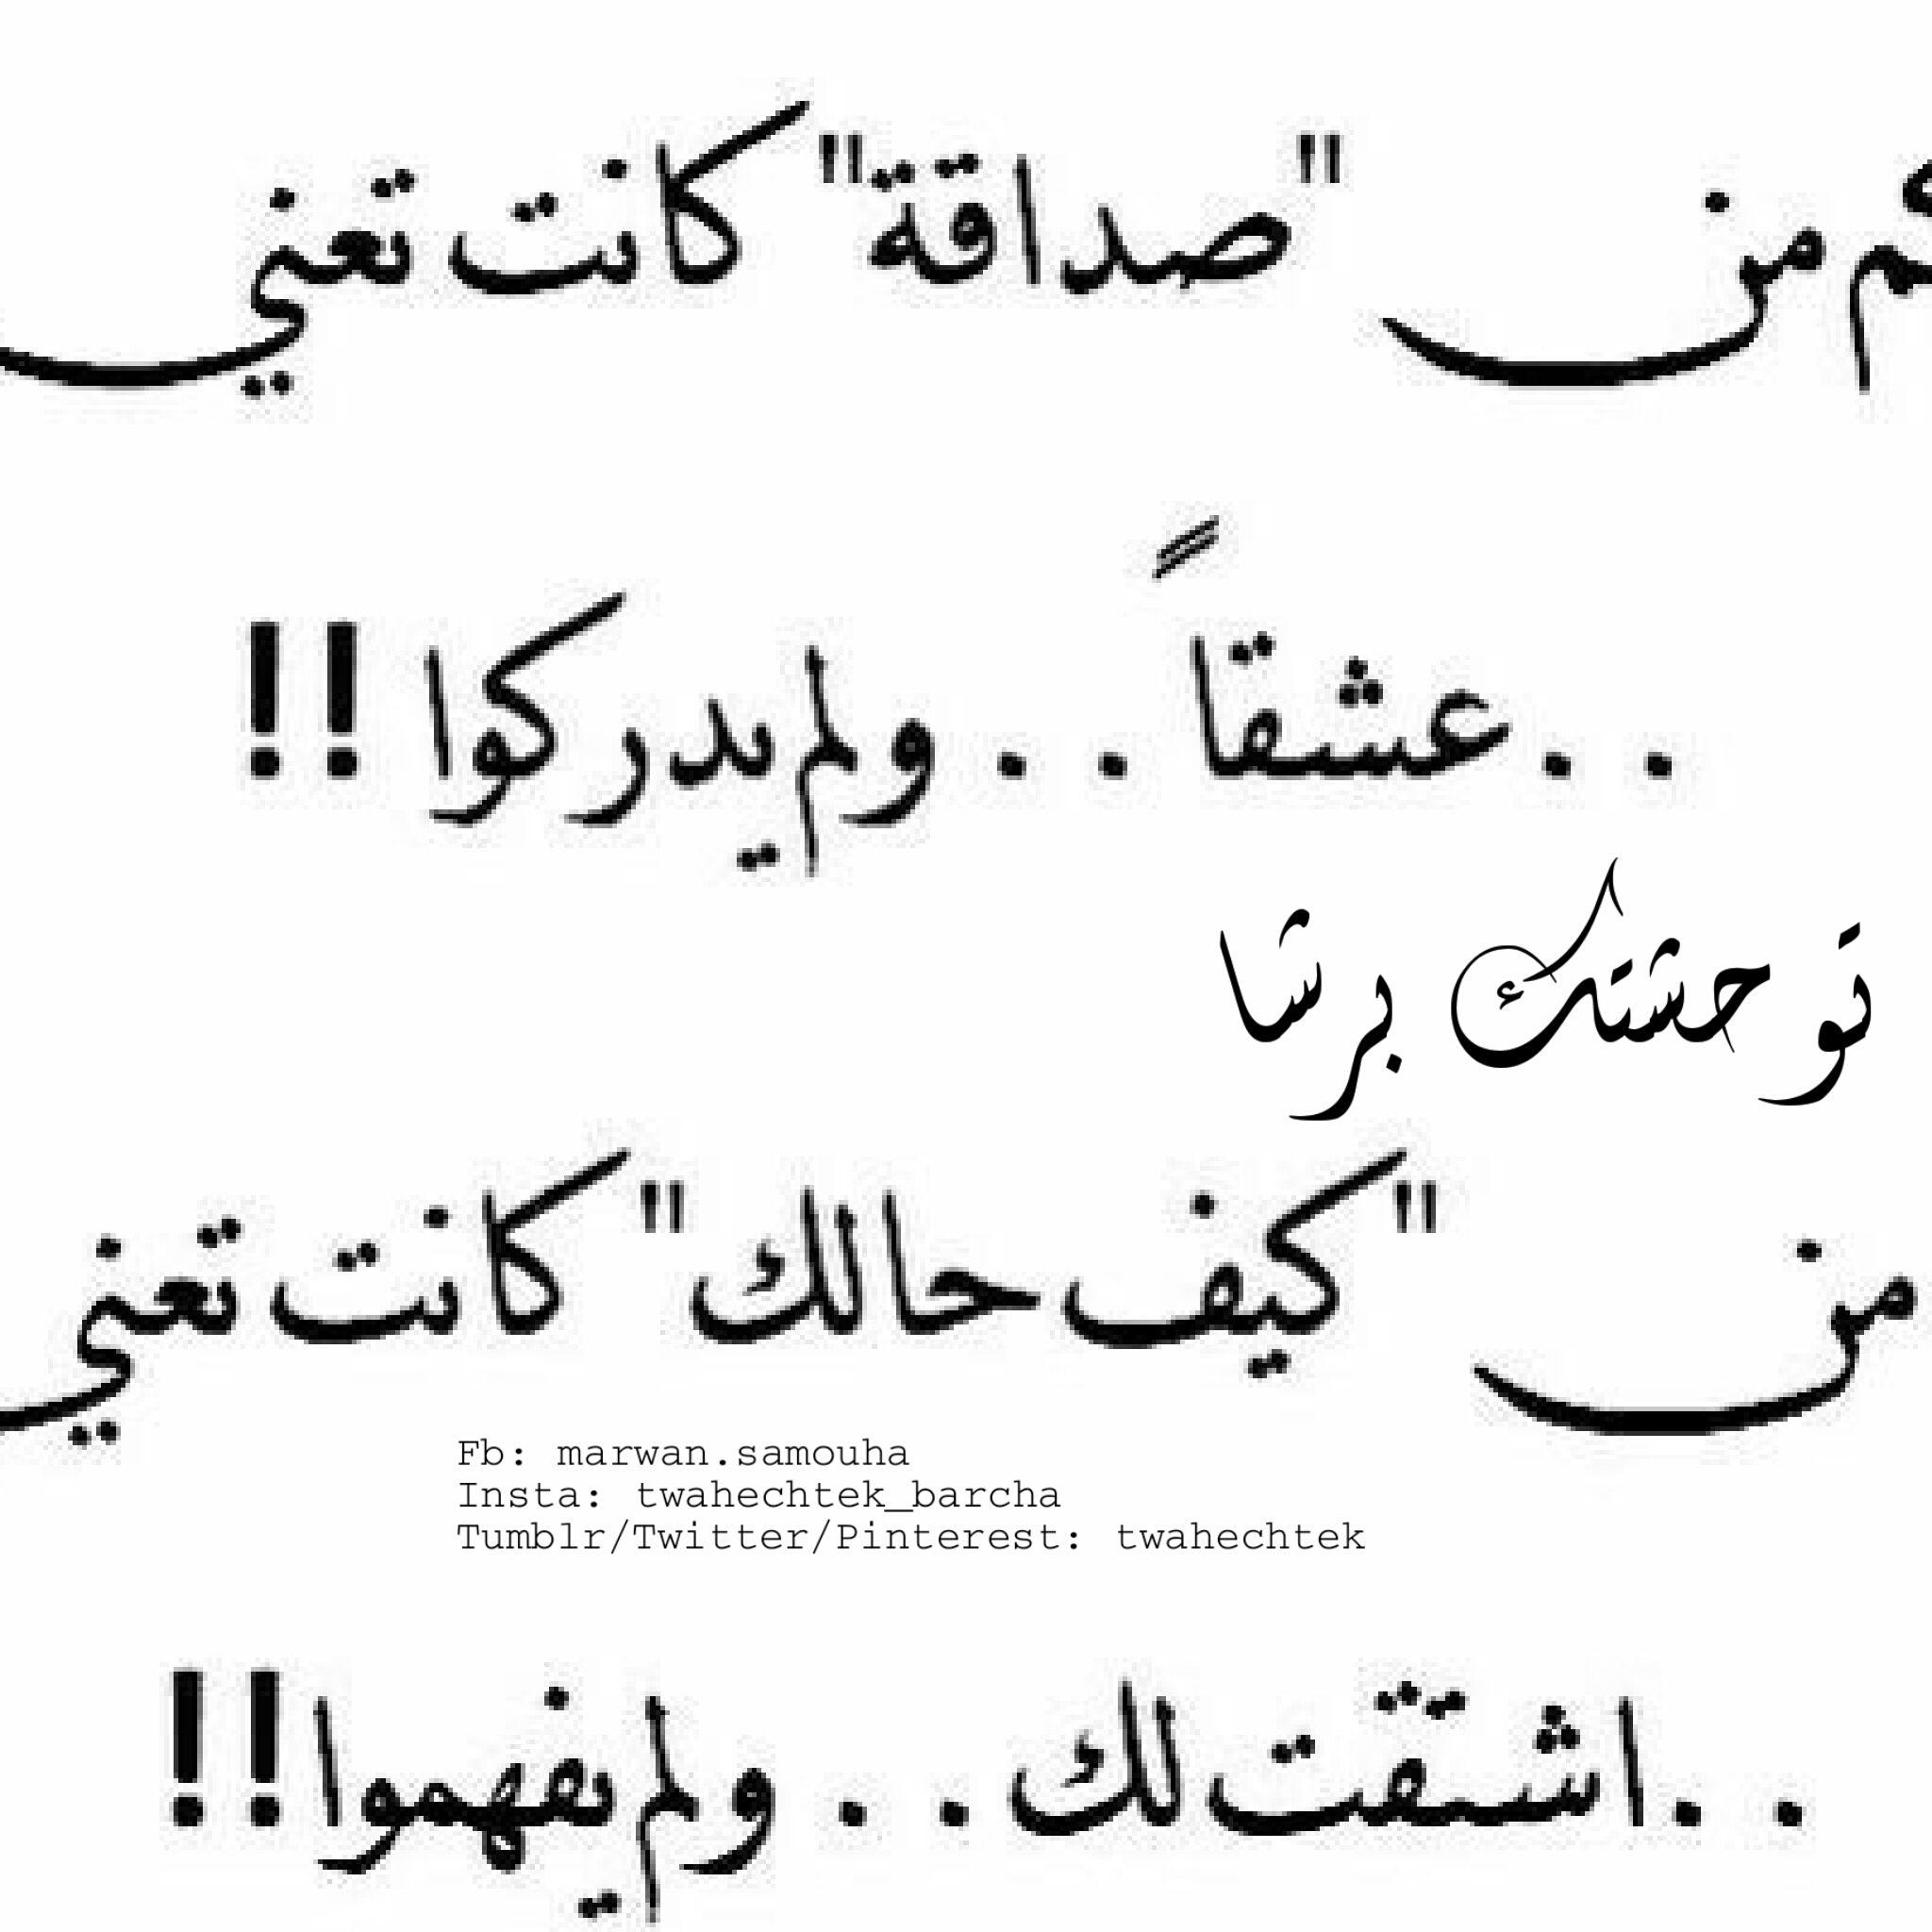 اشتقت لك ولم يفهموا Words Arabic Calligraphy Calligraphy